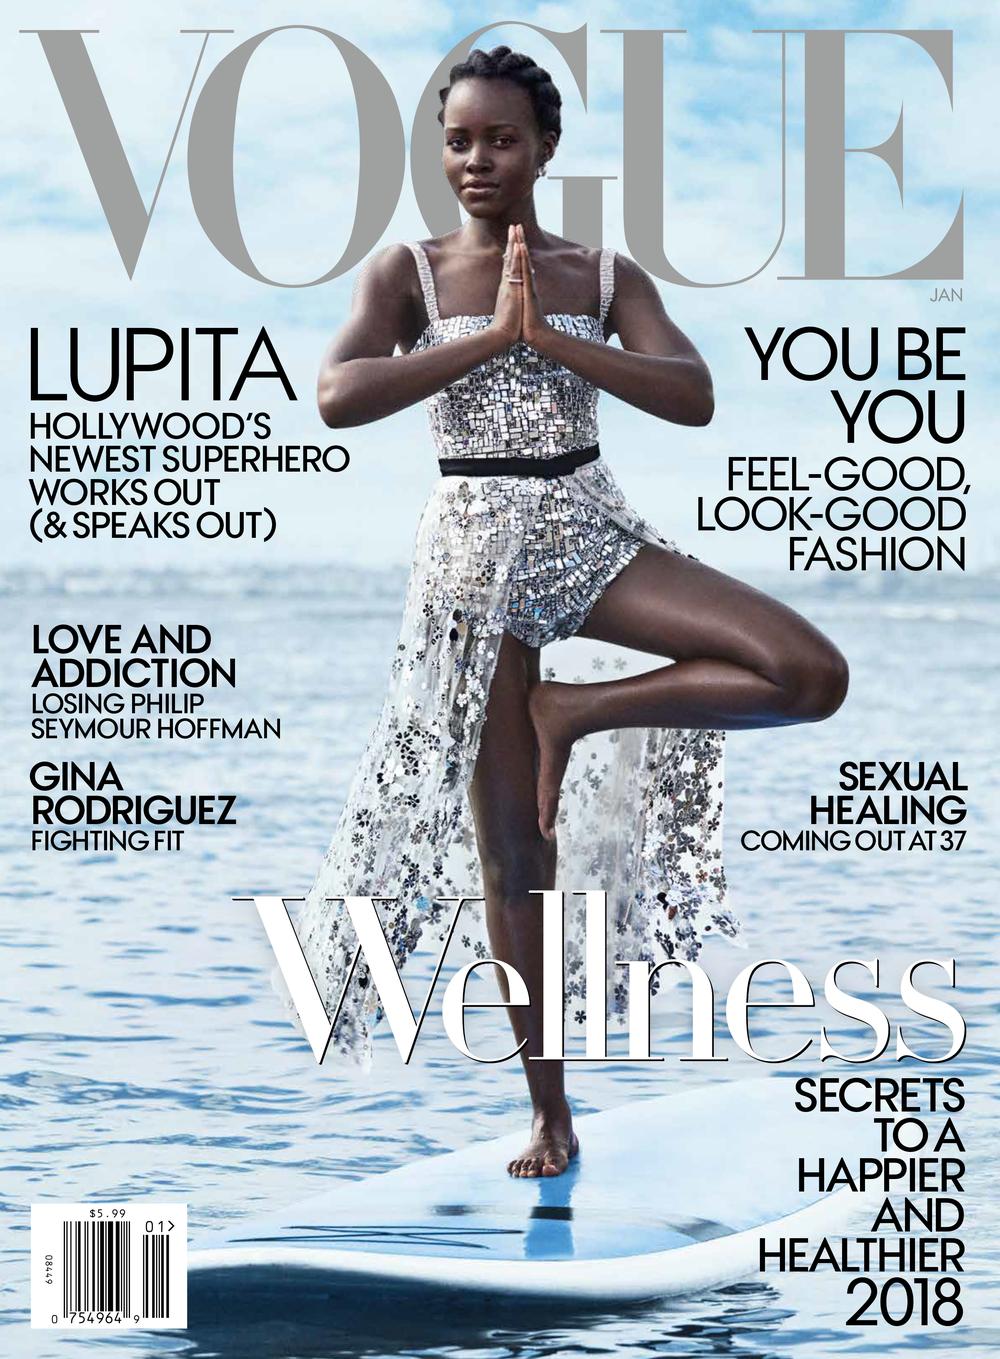 Vogue-1.png